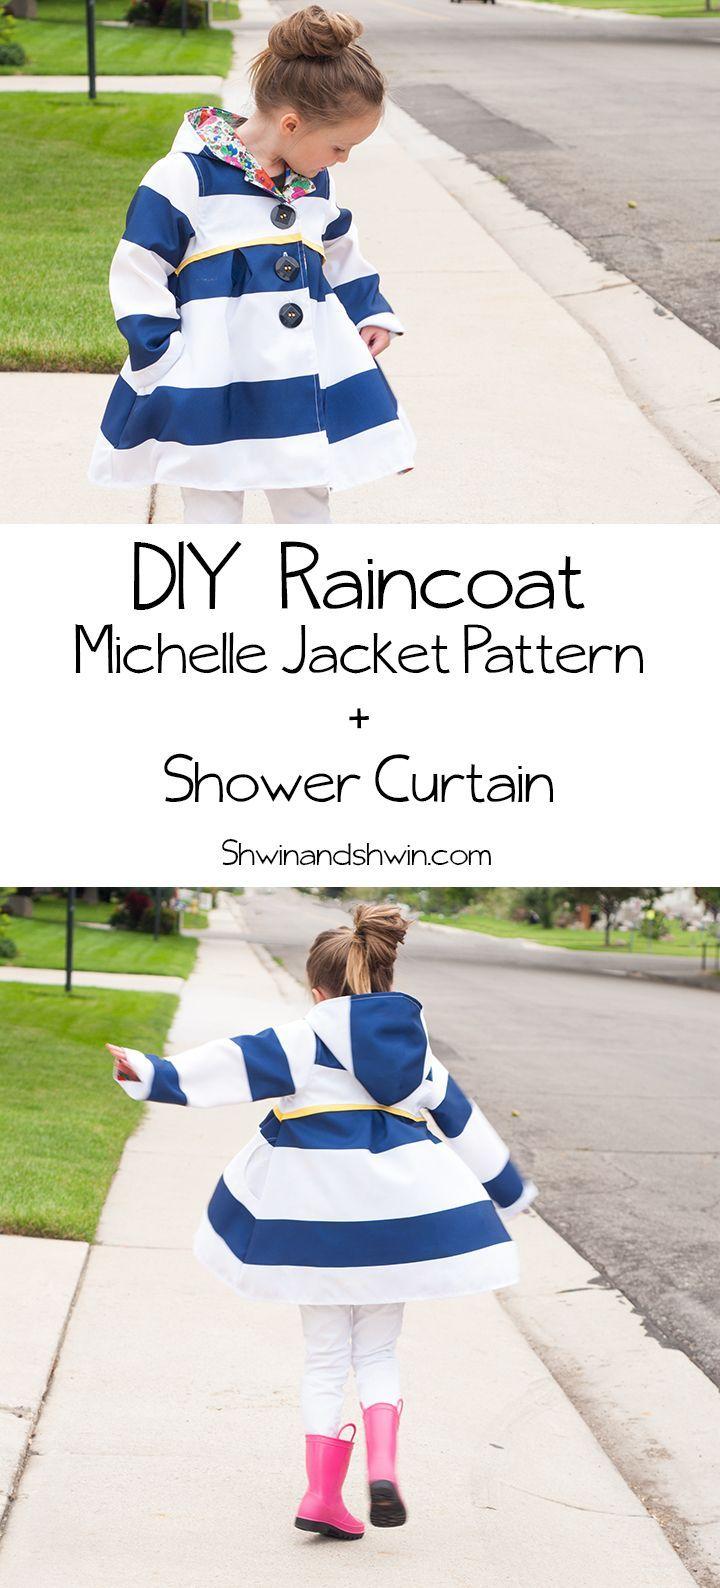 rain coats to sew for children - Google Search